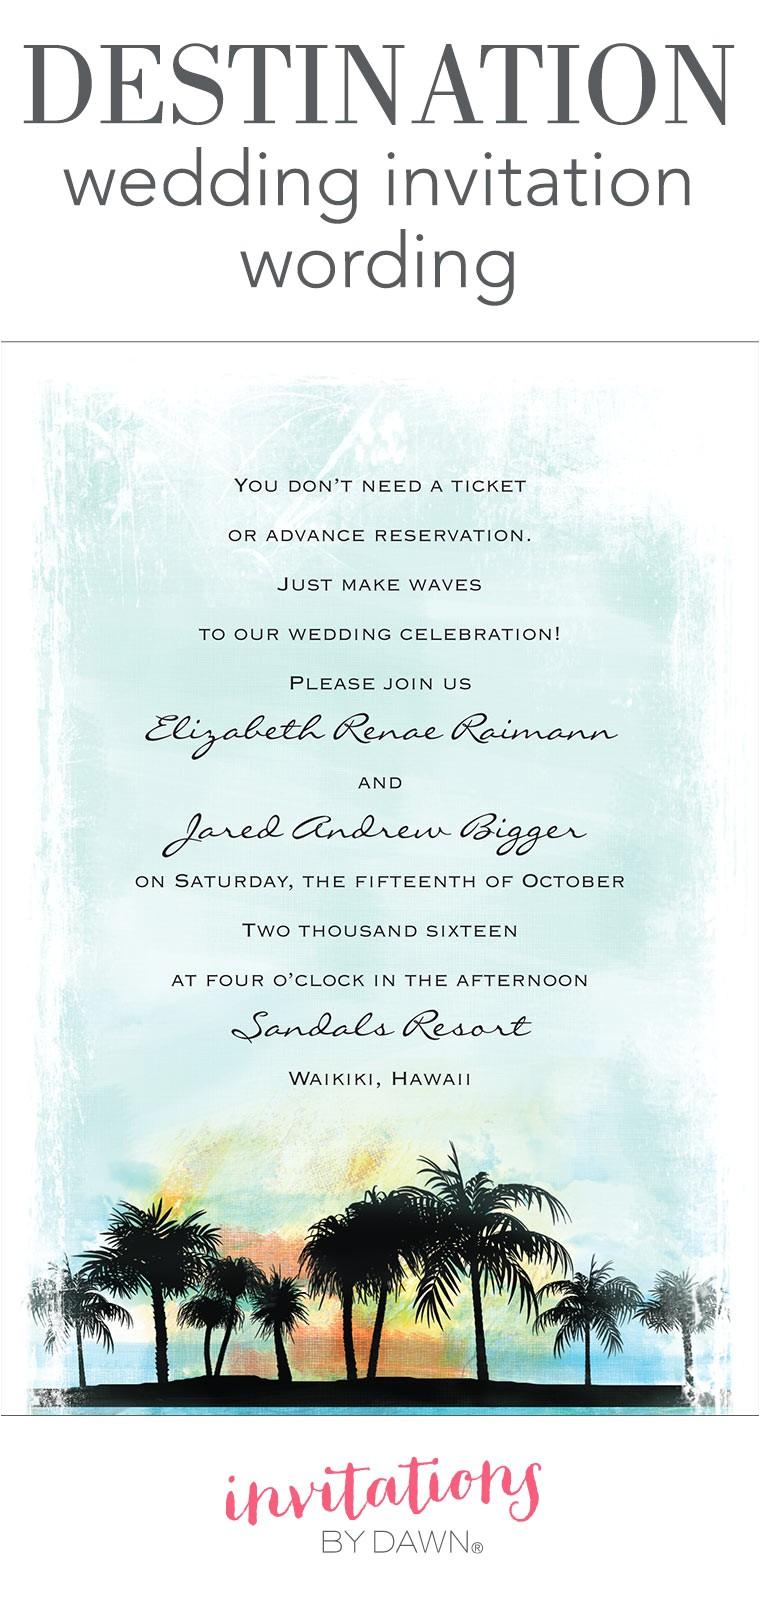 Destination Wedding Invitation Samples Destination Wedding Invitation Wording Invitations by Dawn